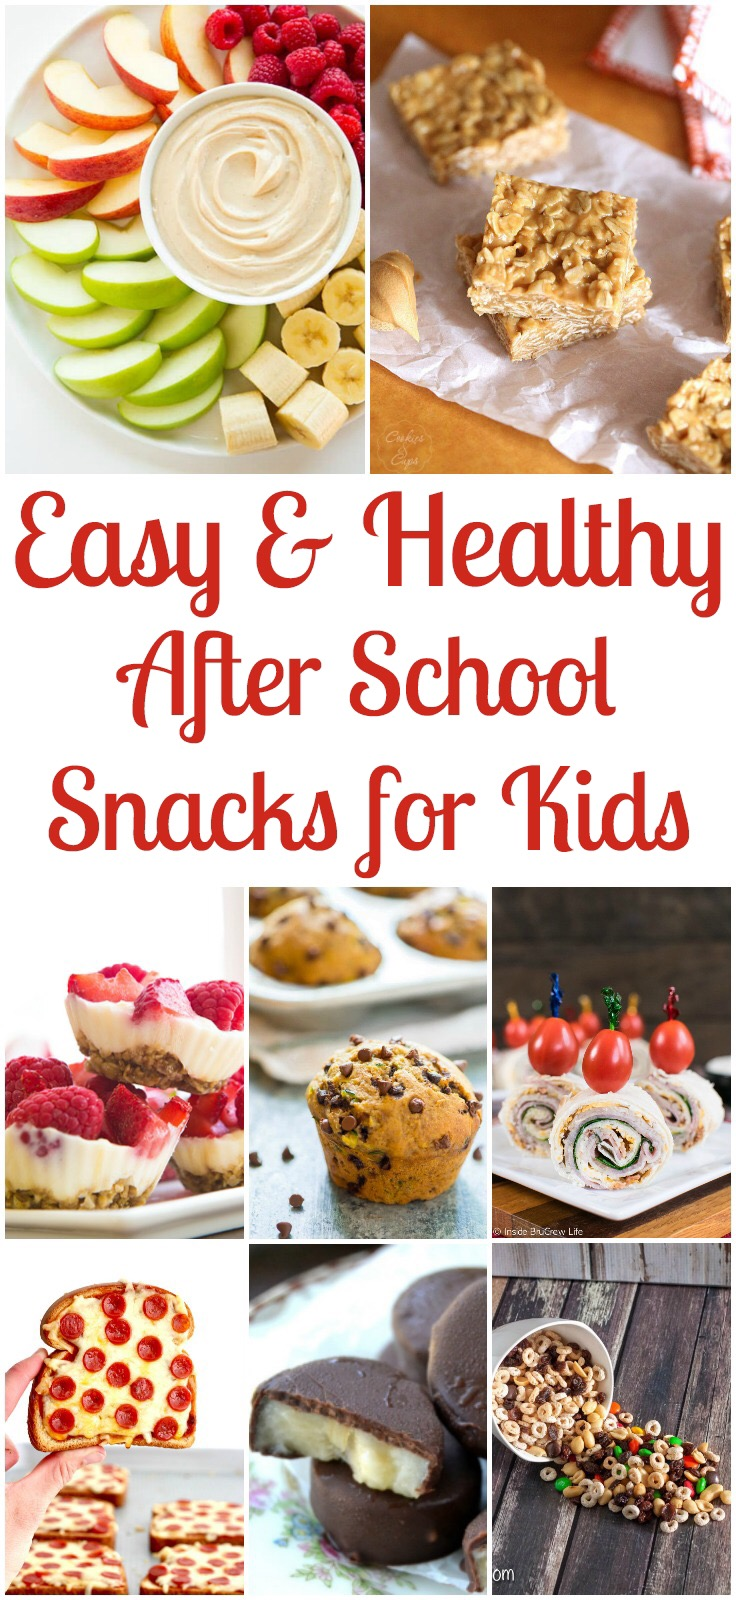 17 Easy & healthy afternoon snacks for kids, after school snacks, toddler snack ideas, yogurt dip, turkey pinwheels, pizza toast